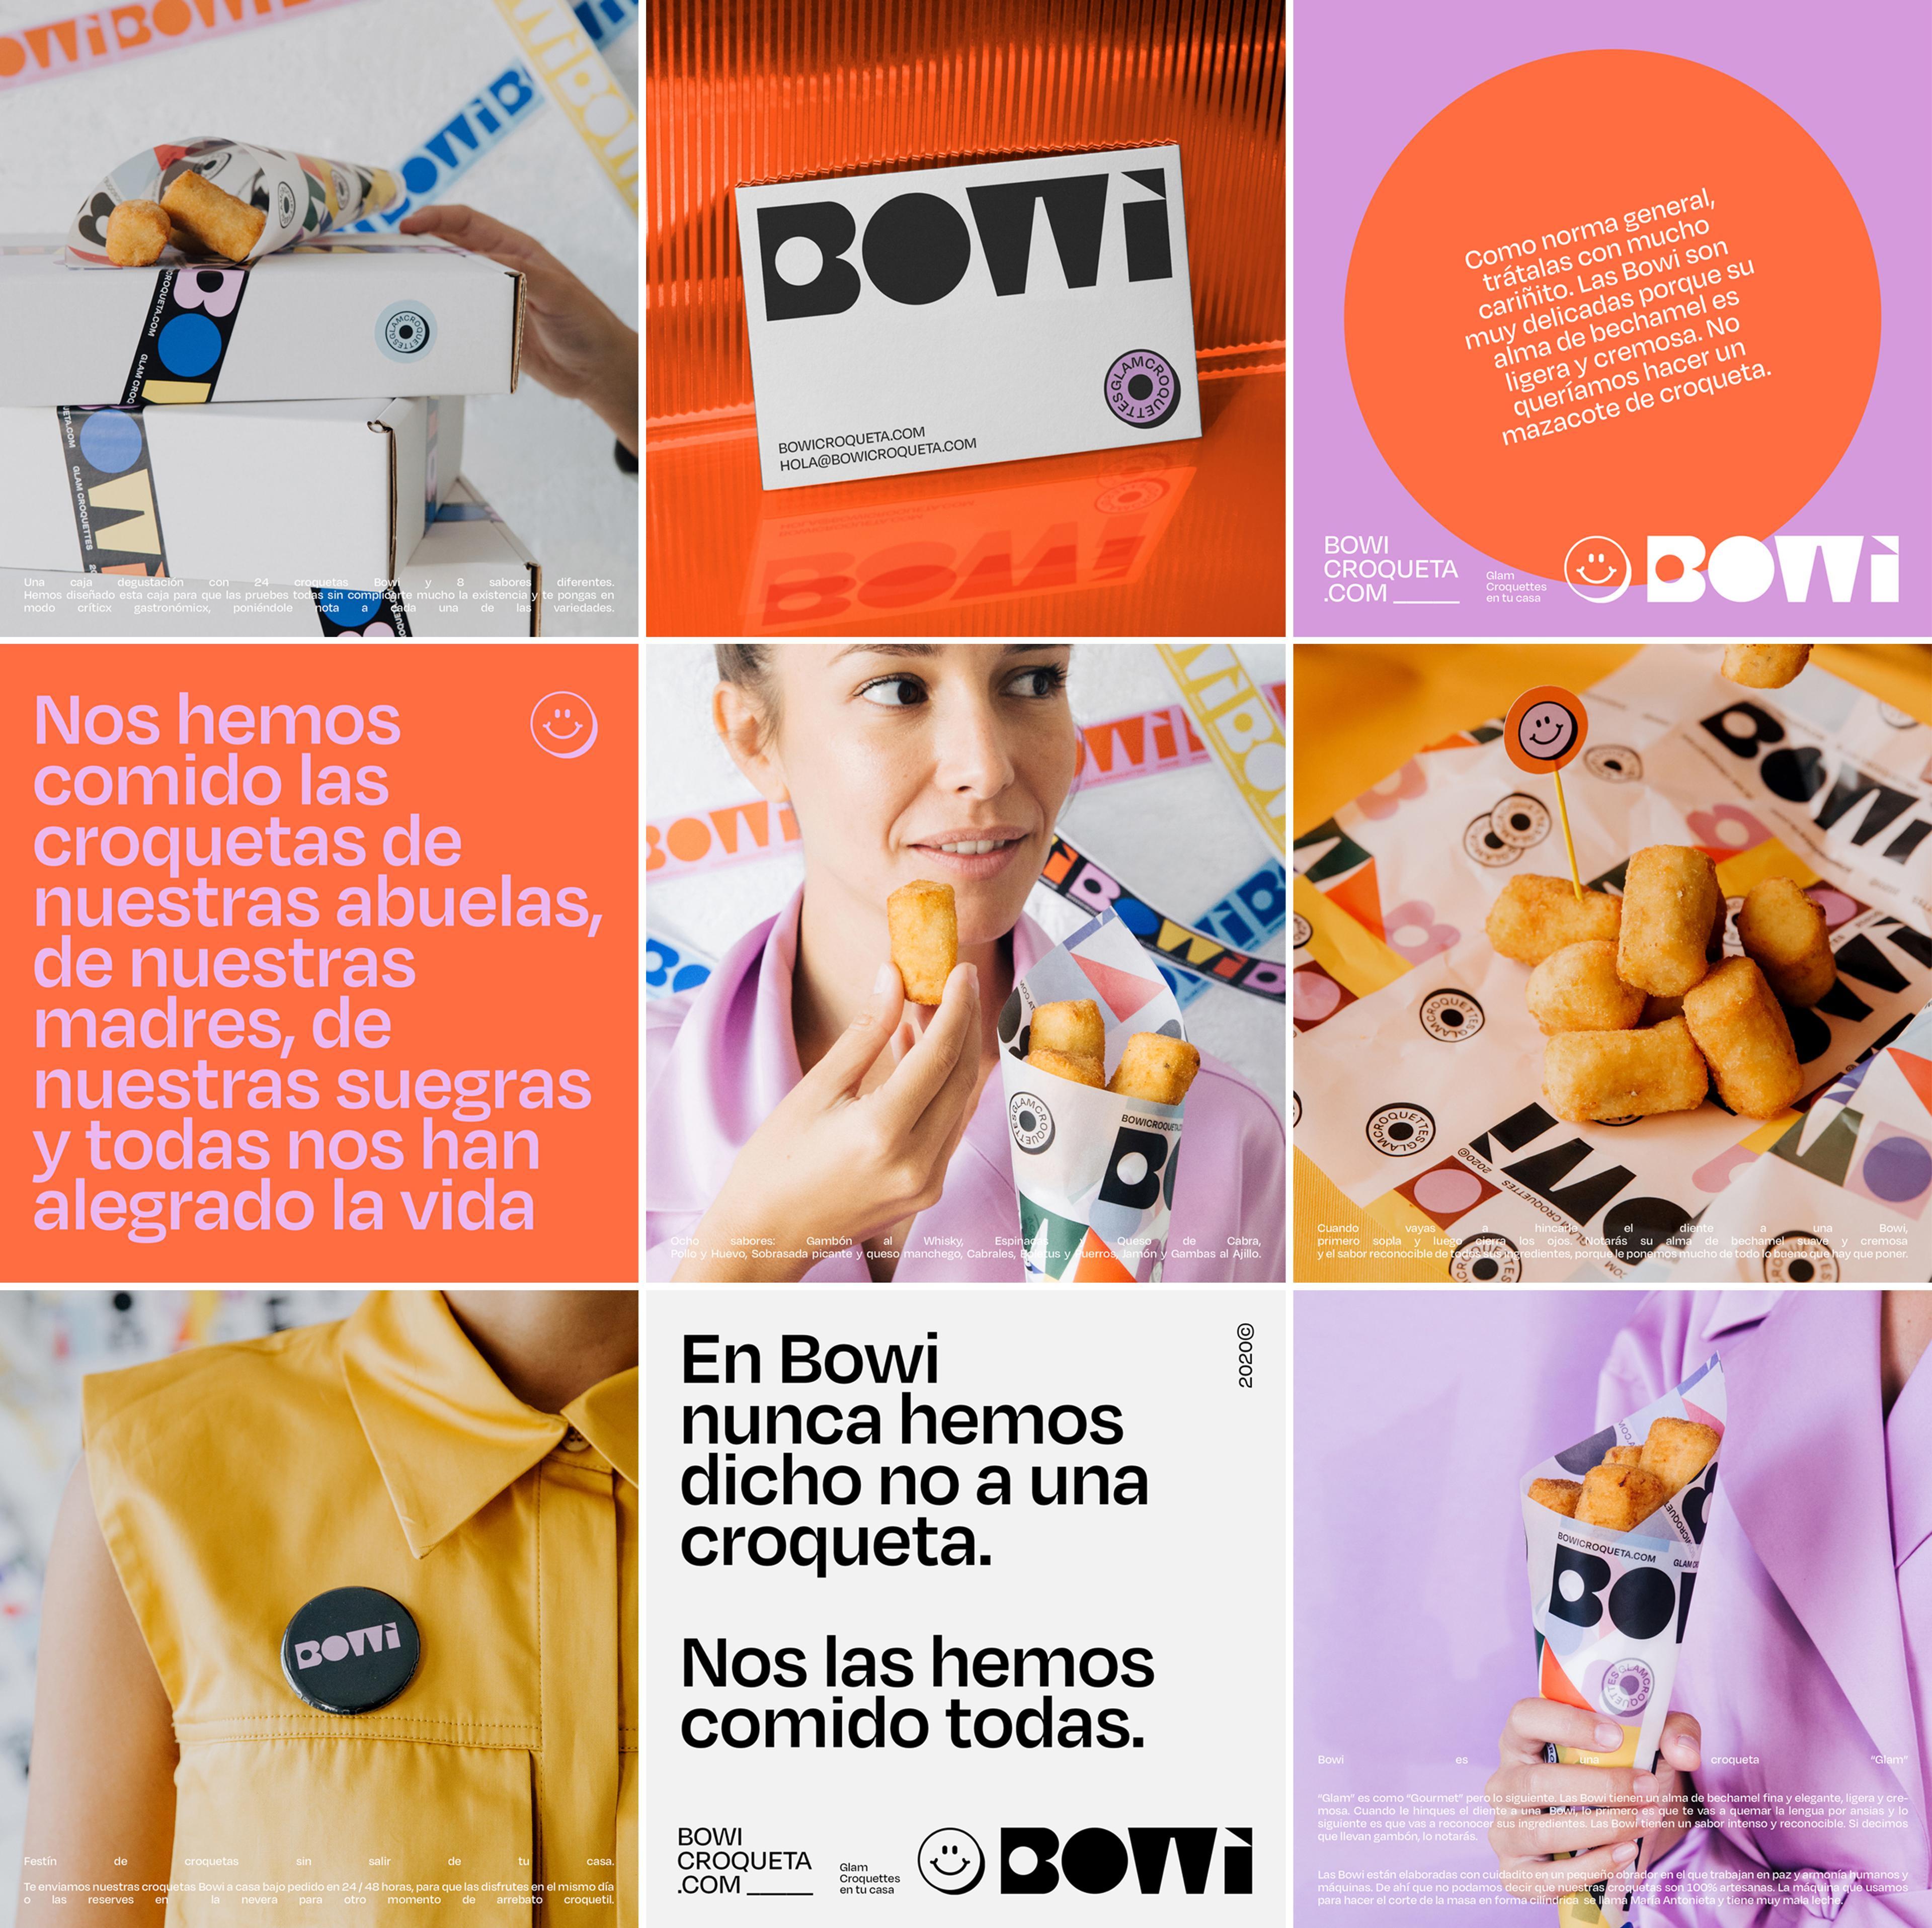 Bowi Croqueta Instagram Layout by Blavet Studio